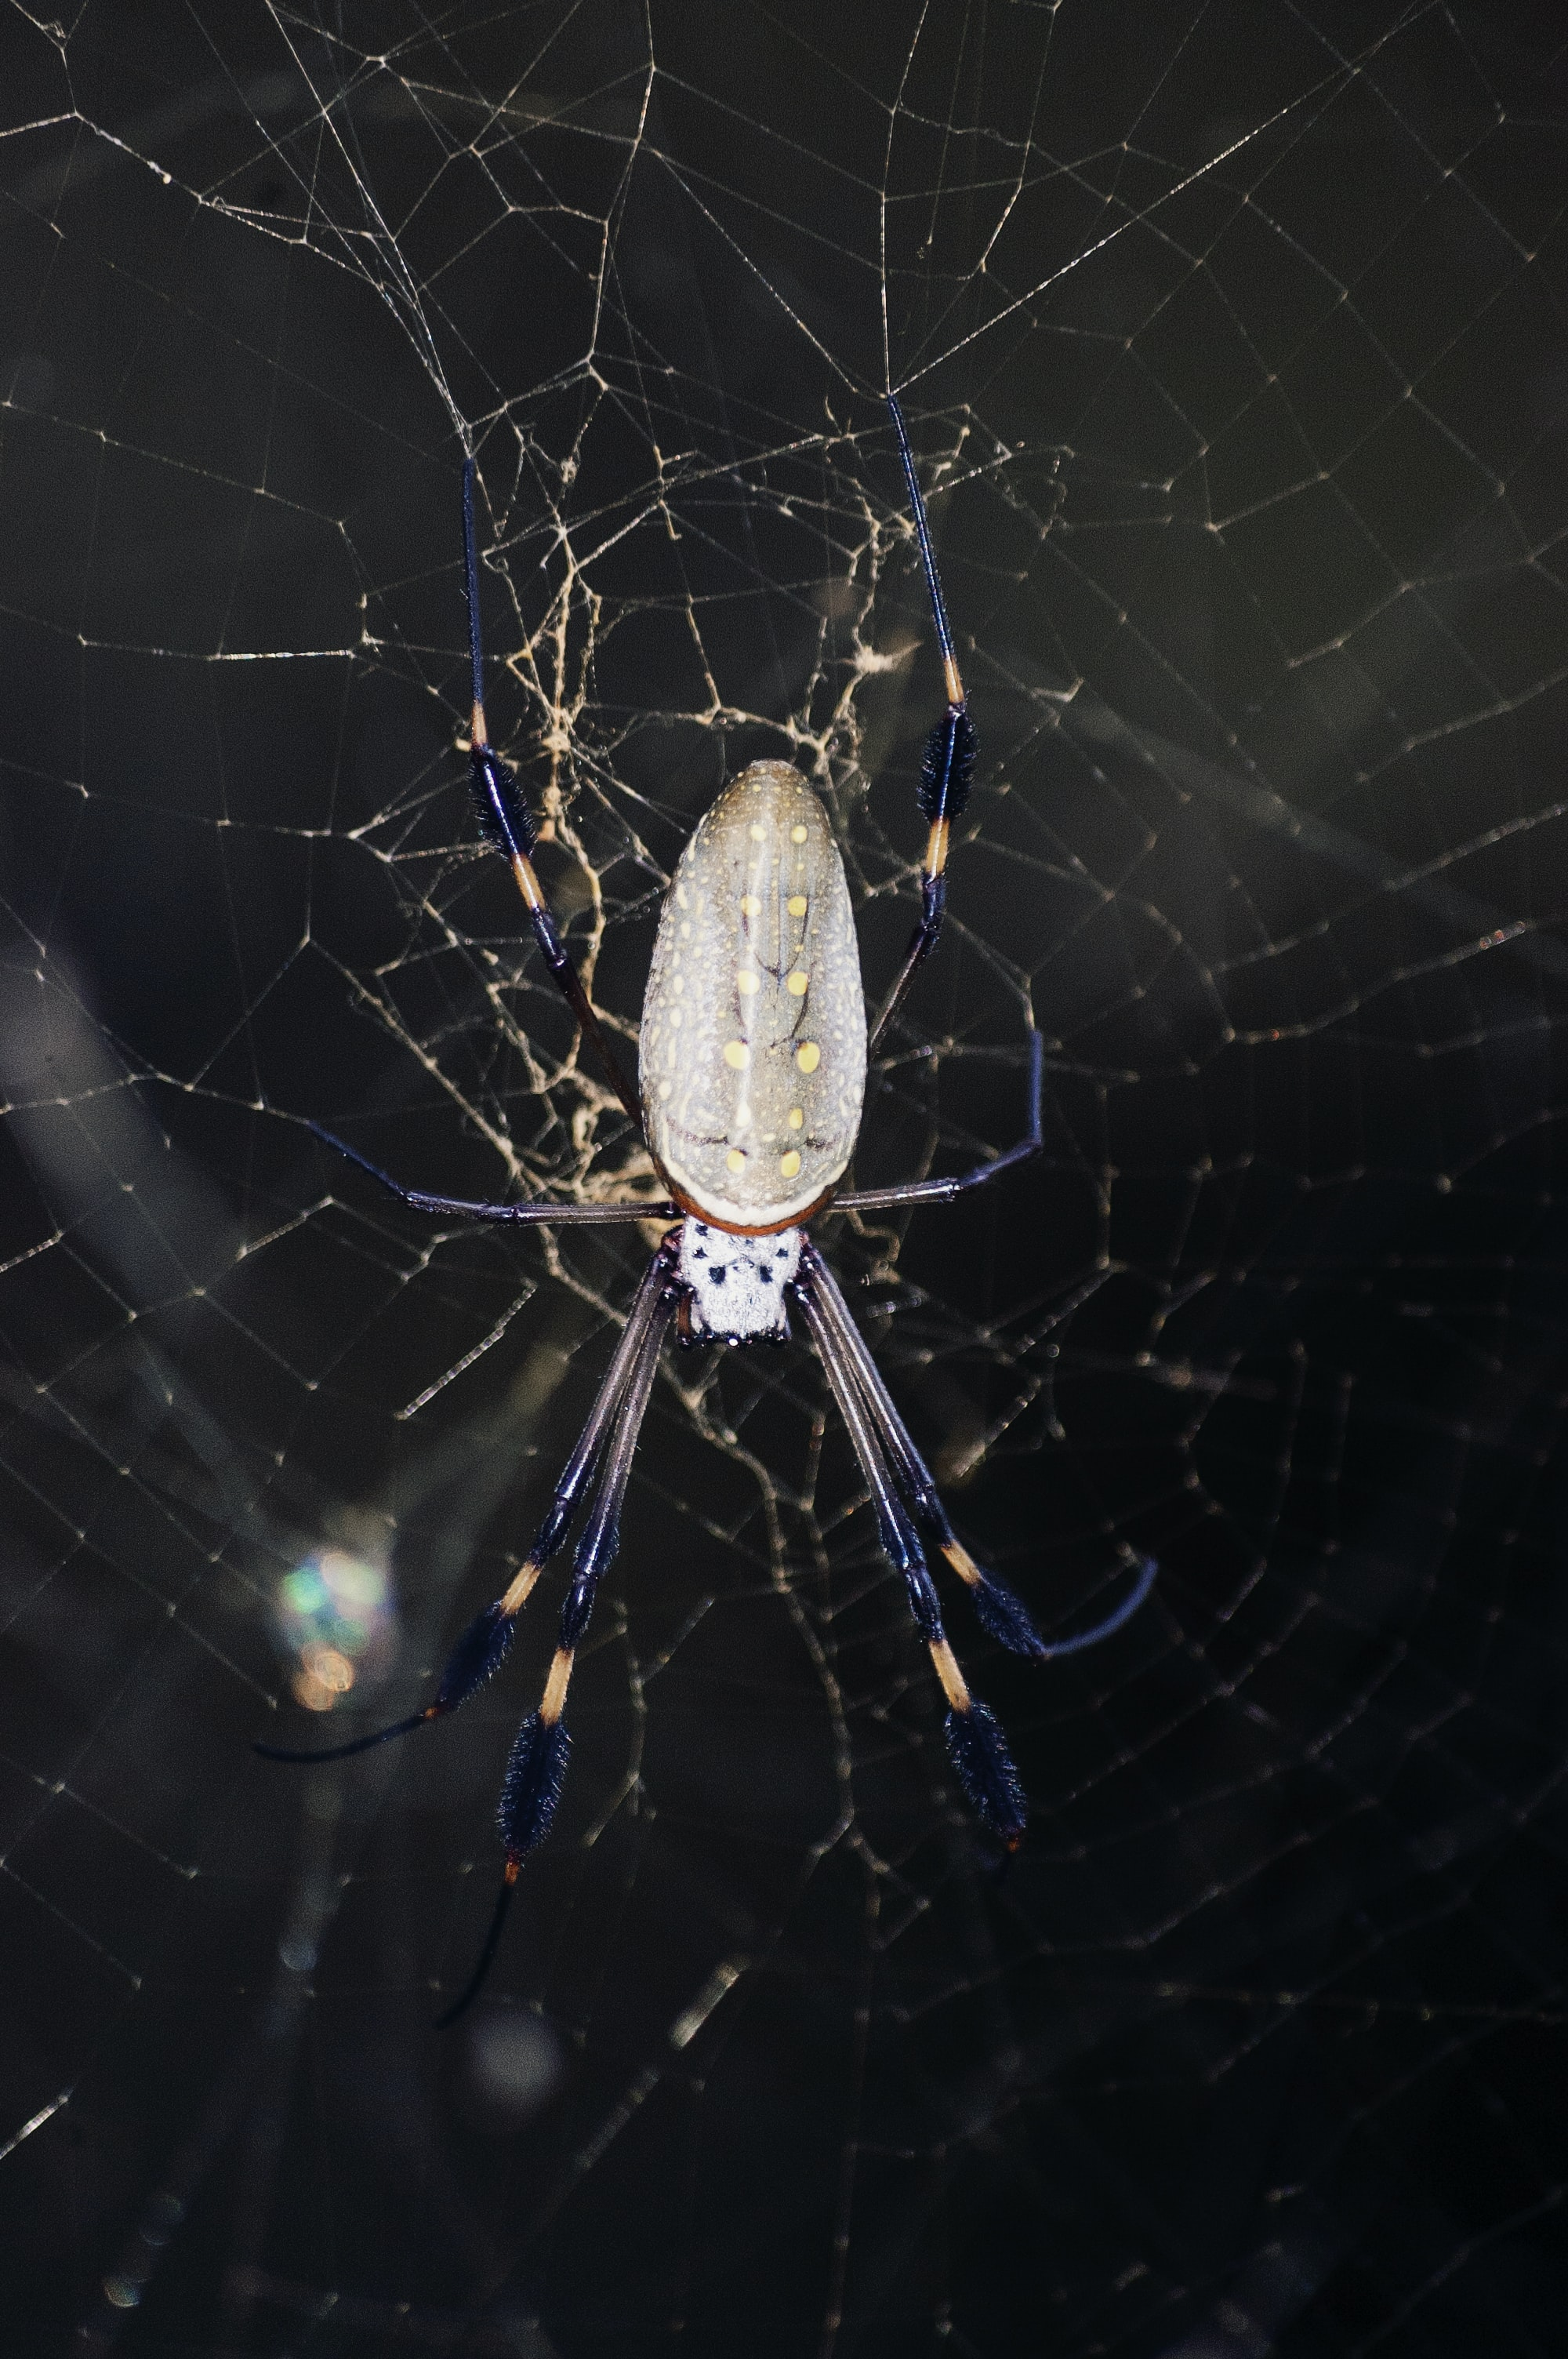 gray spider on cobweb